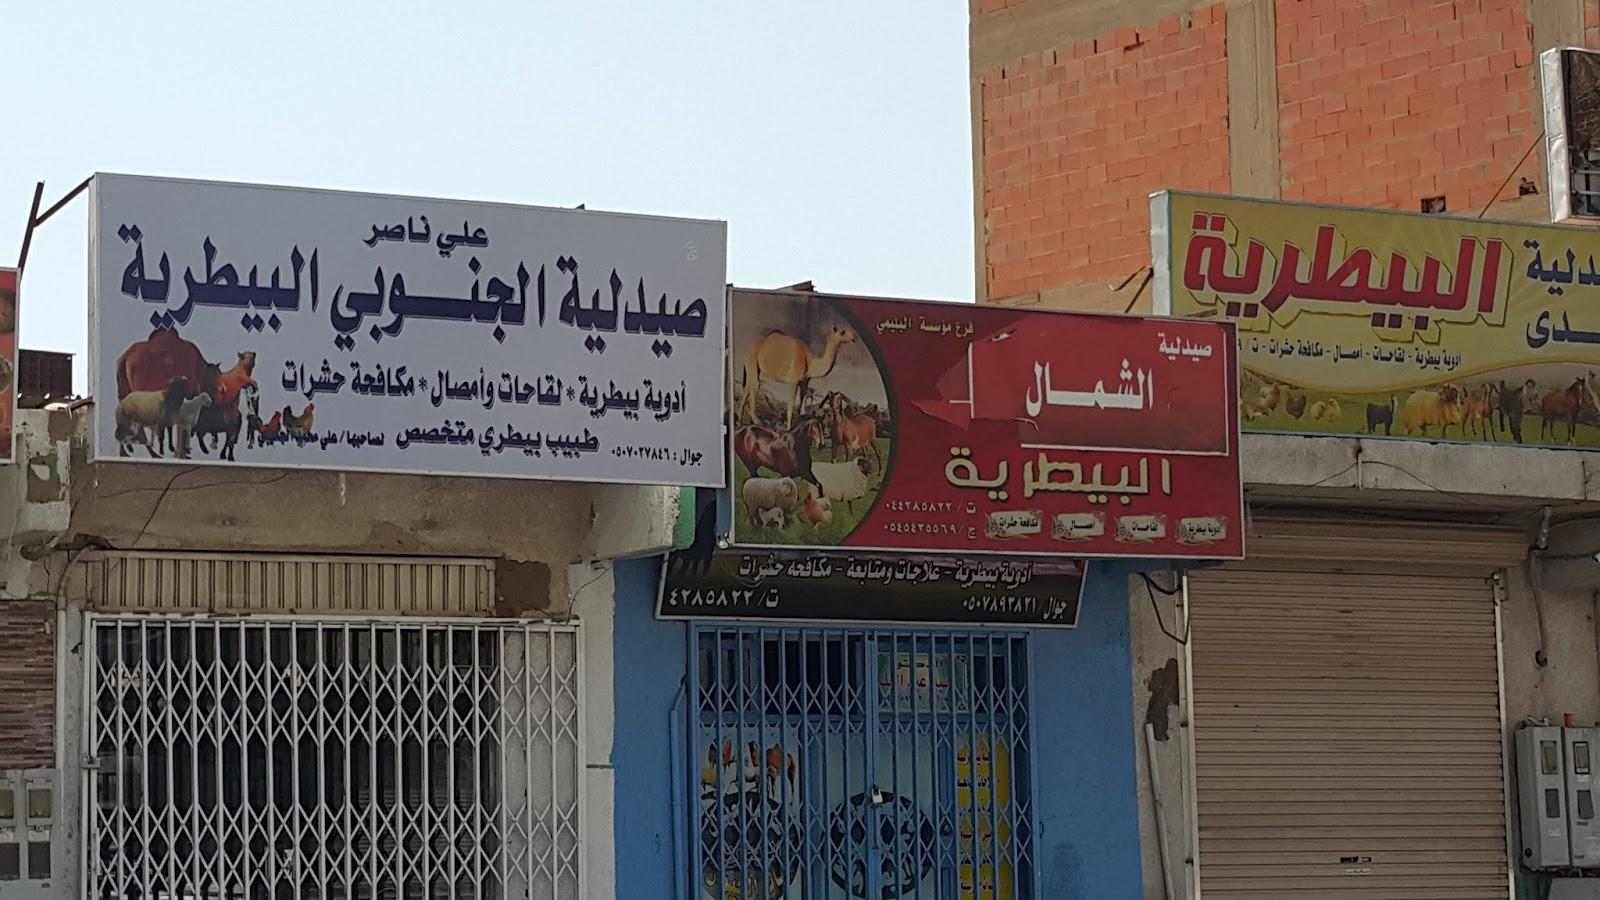 Incontri in Arabia Saudita espatriati